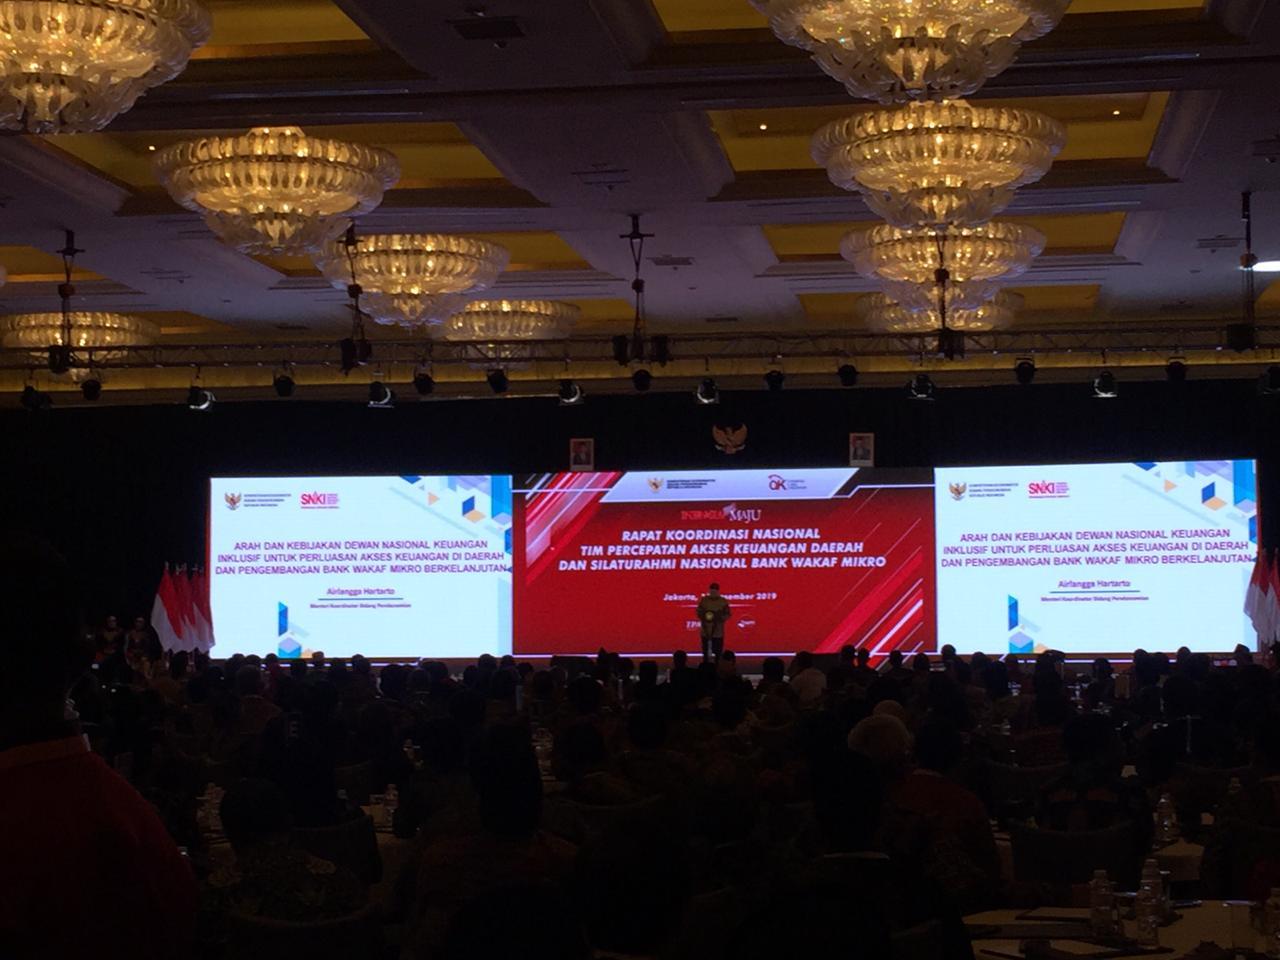 https: img-o.okeinfo.net content 2019 12 10 20 2140135 pertumbuhan-ekonomi-indonesia-hanya-5-jokowi-patut-disyukuri-lyTxzW1Jki.jpg